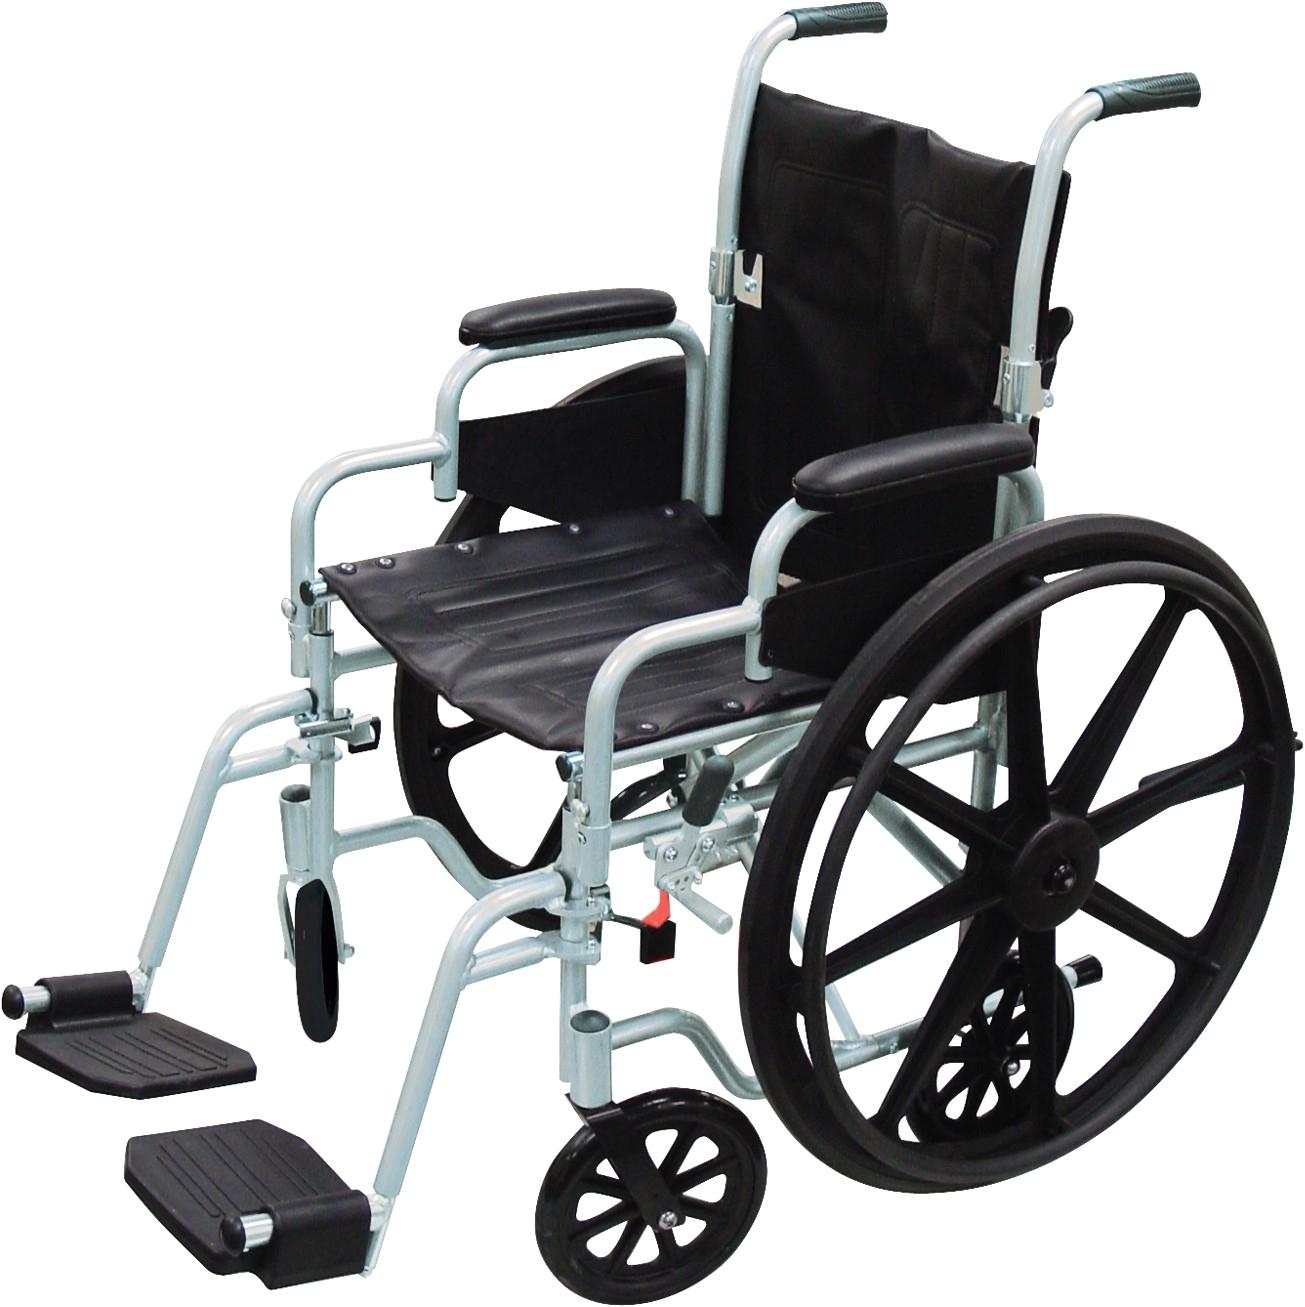 Rollator Transport Chair Combo Poly Fly High Strength Lightweight Wheelchair Flyweight Transport